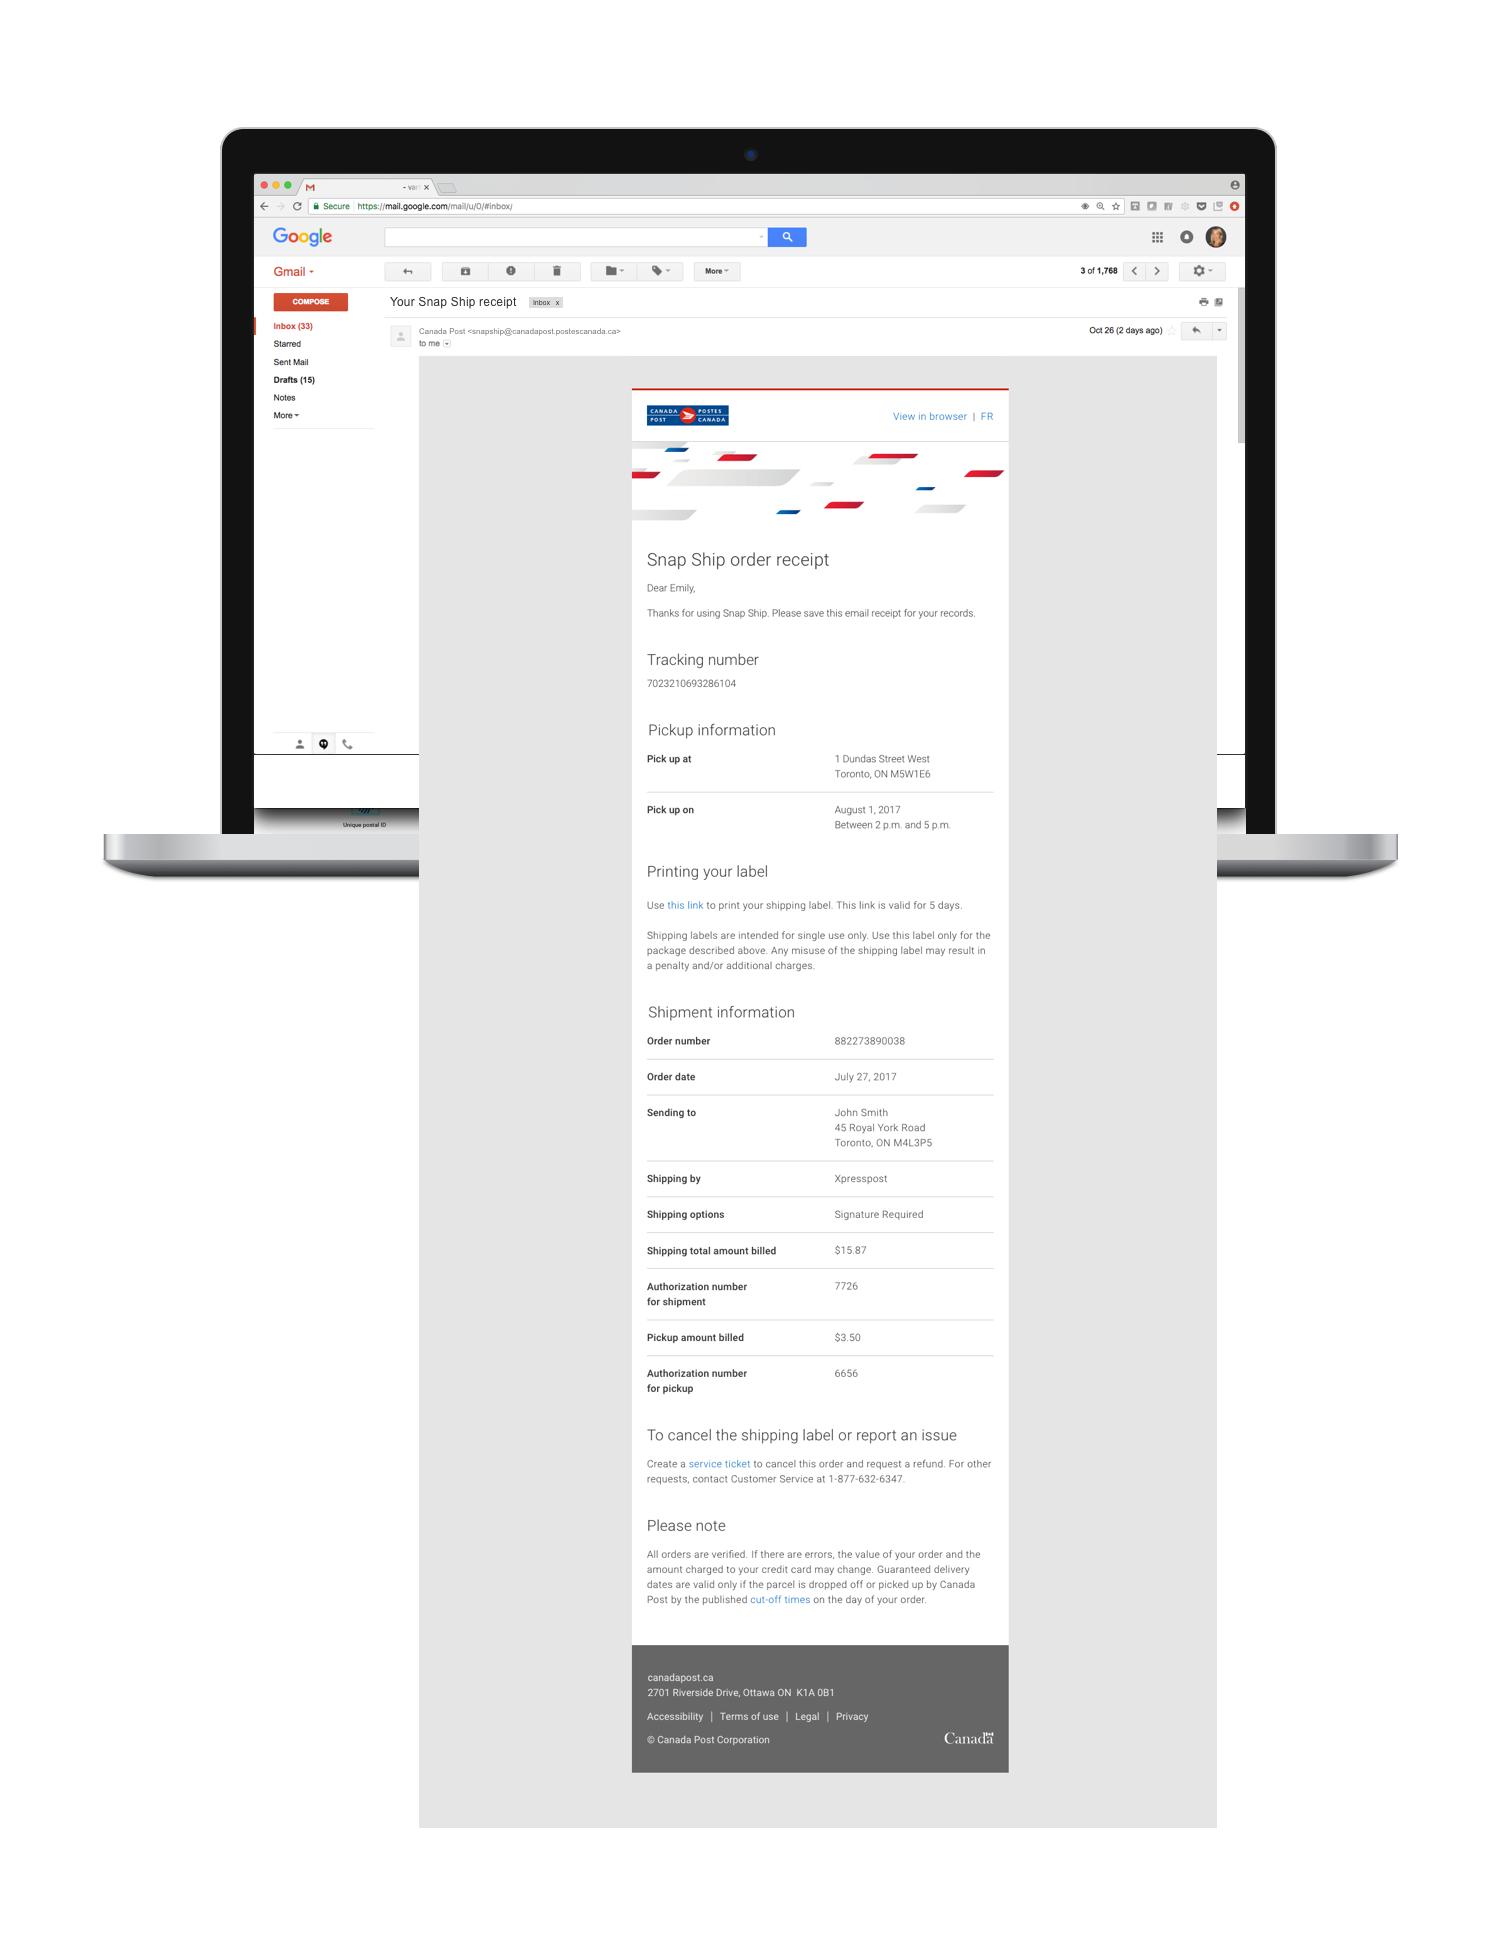 Transactional email - SnapShip order receipt